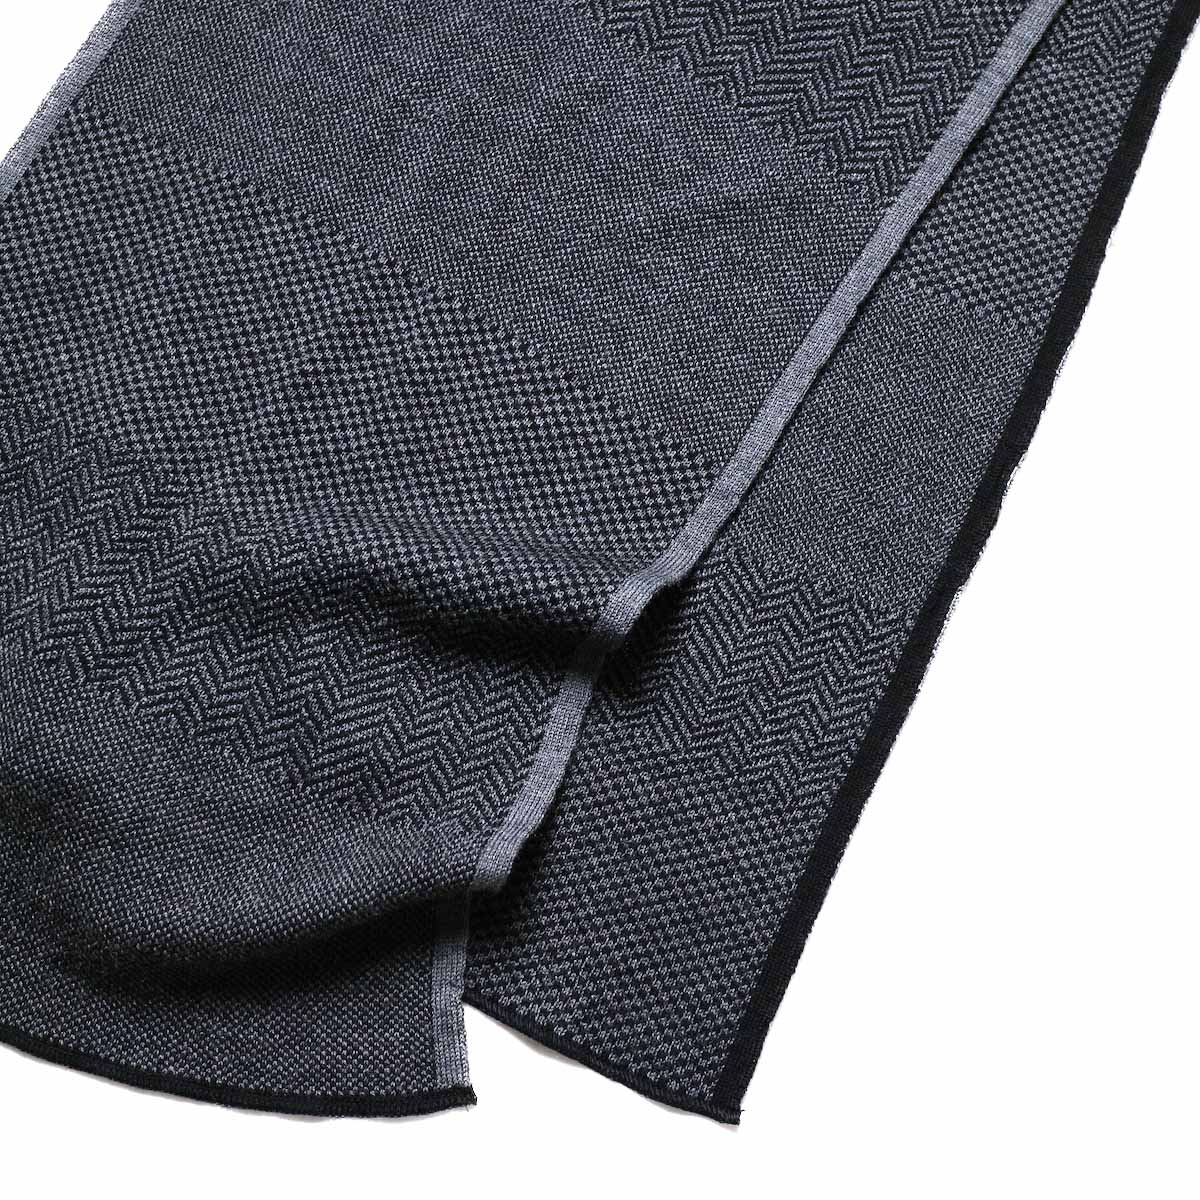 Engineered Garments / Knit Scarf - Wool HBチャコール